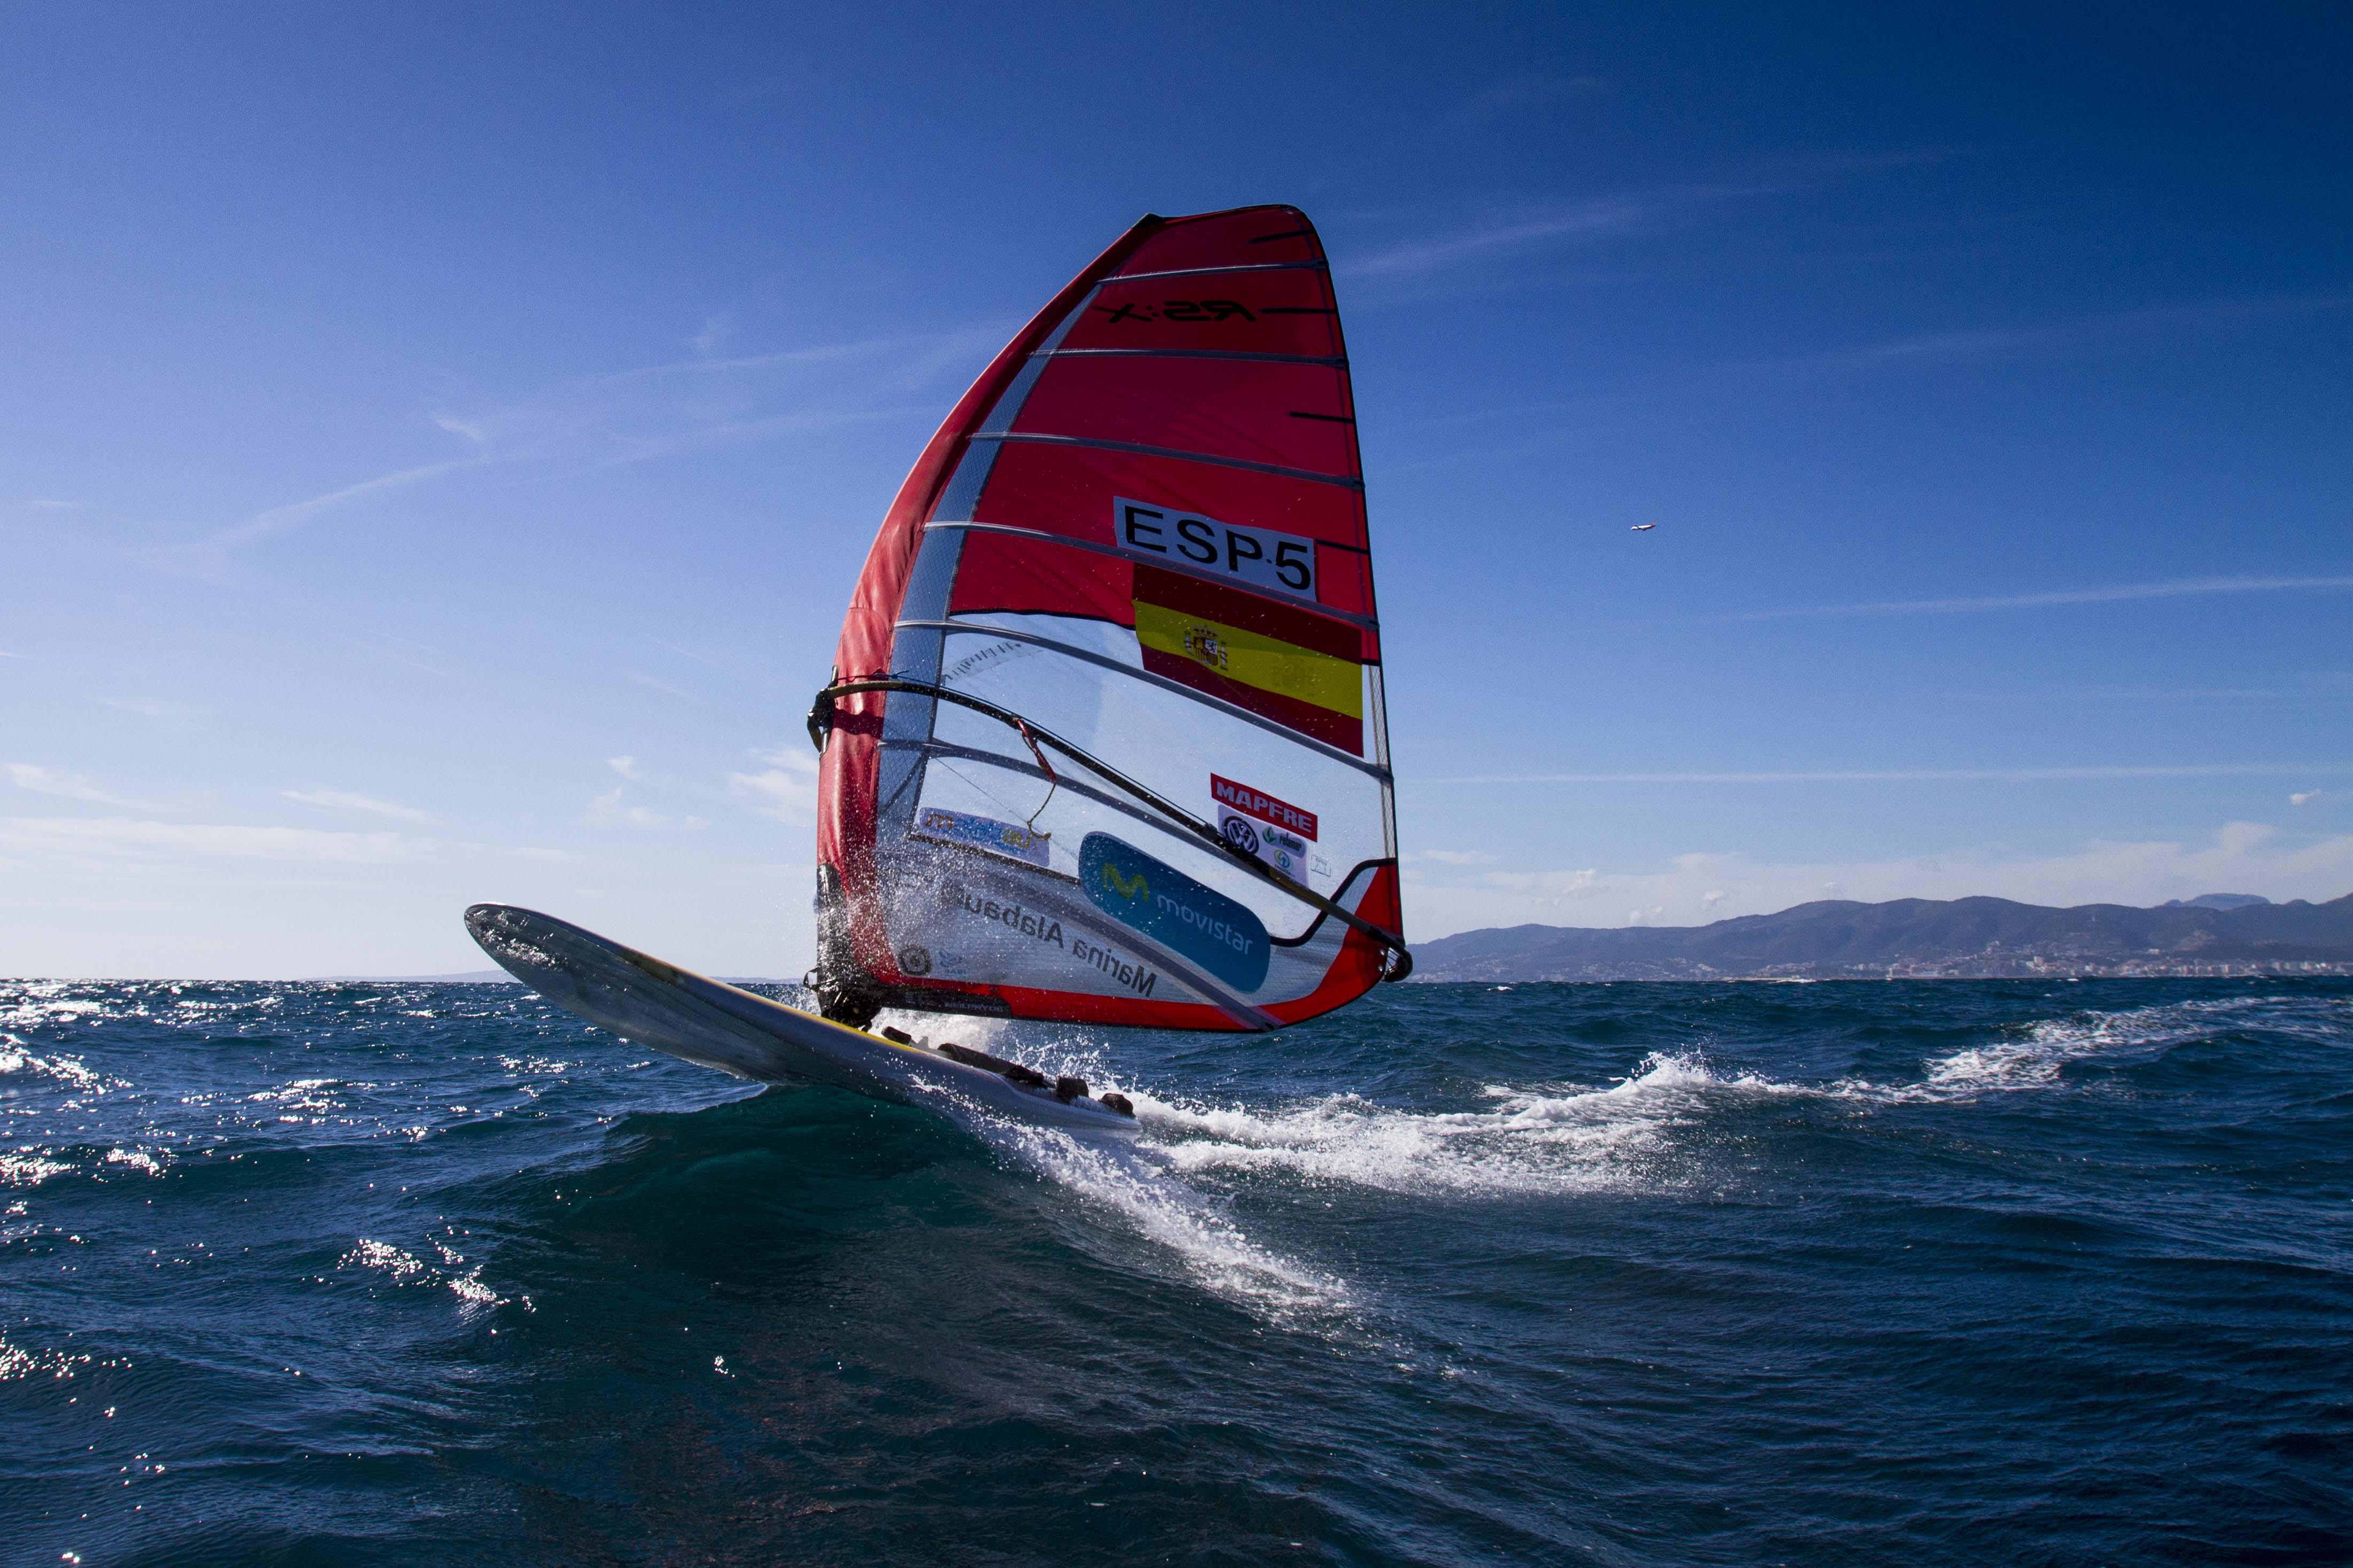 La windsurfista Movistar, Marina Alabau en su RS:X